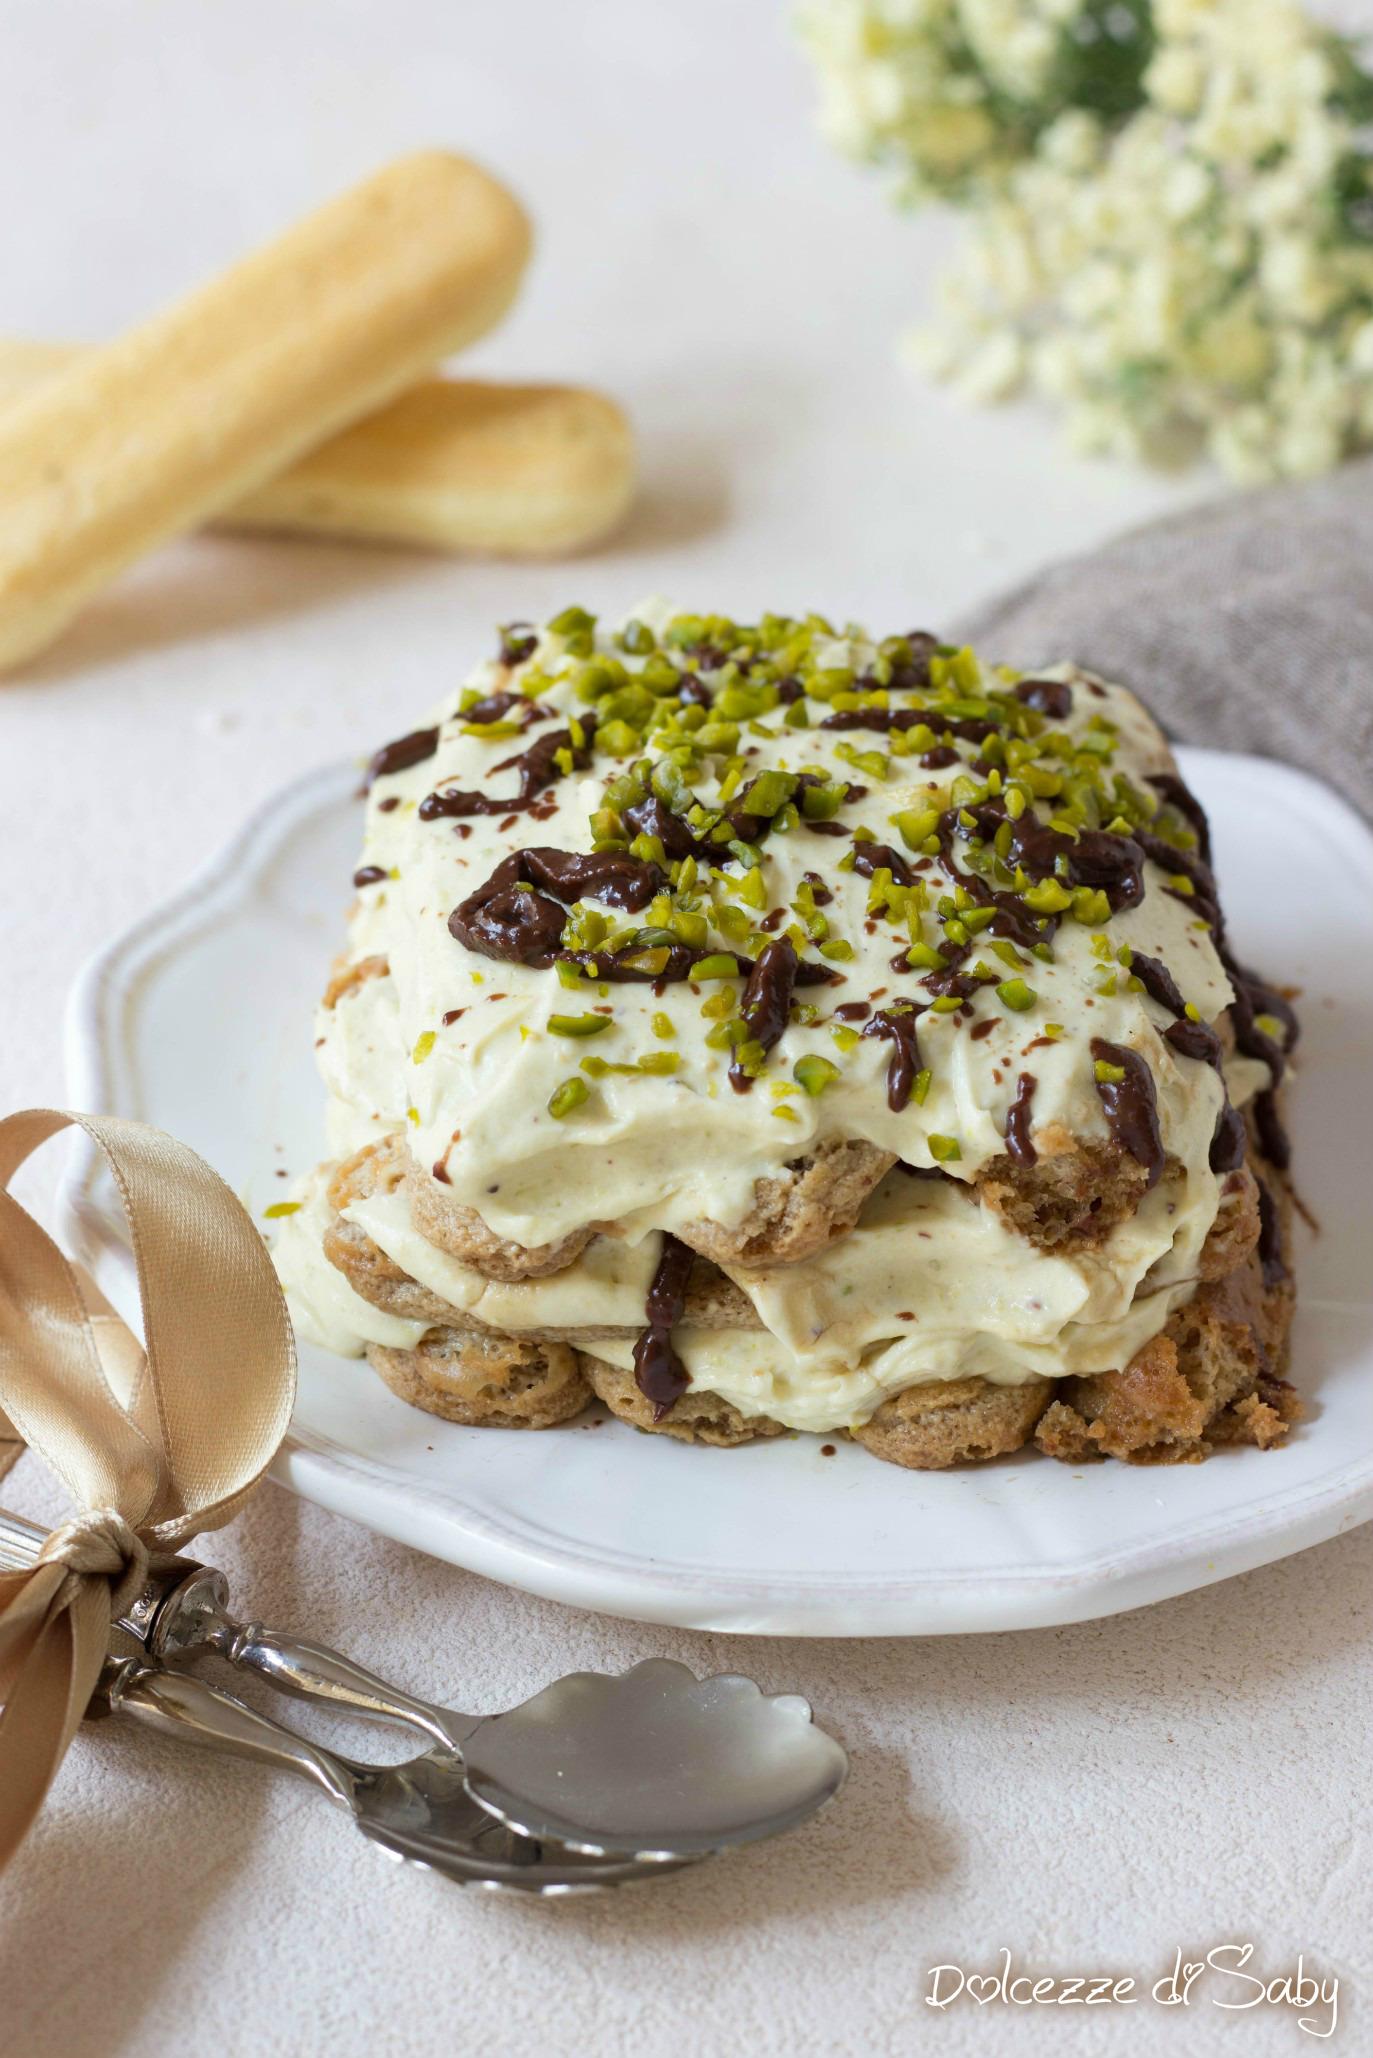 Tiramisú Pistacchio e Nutella (senza Uova)